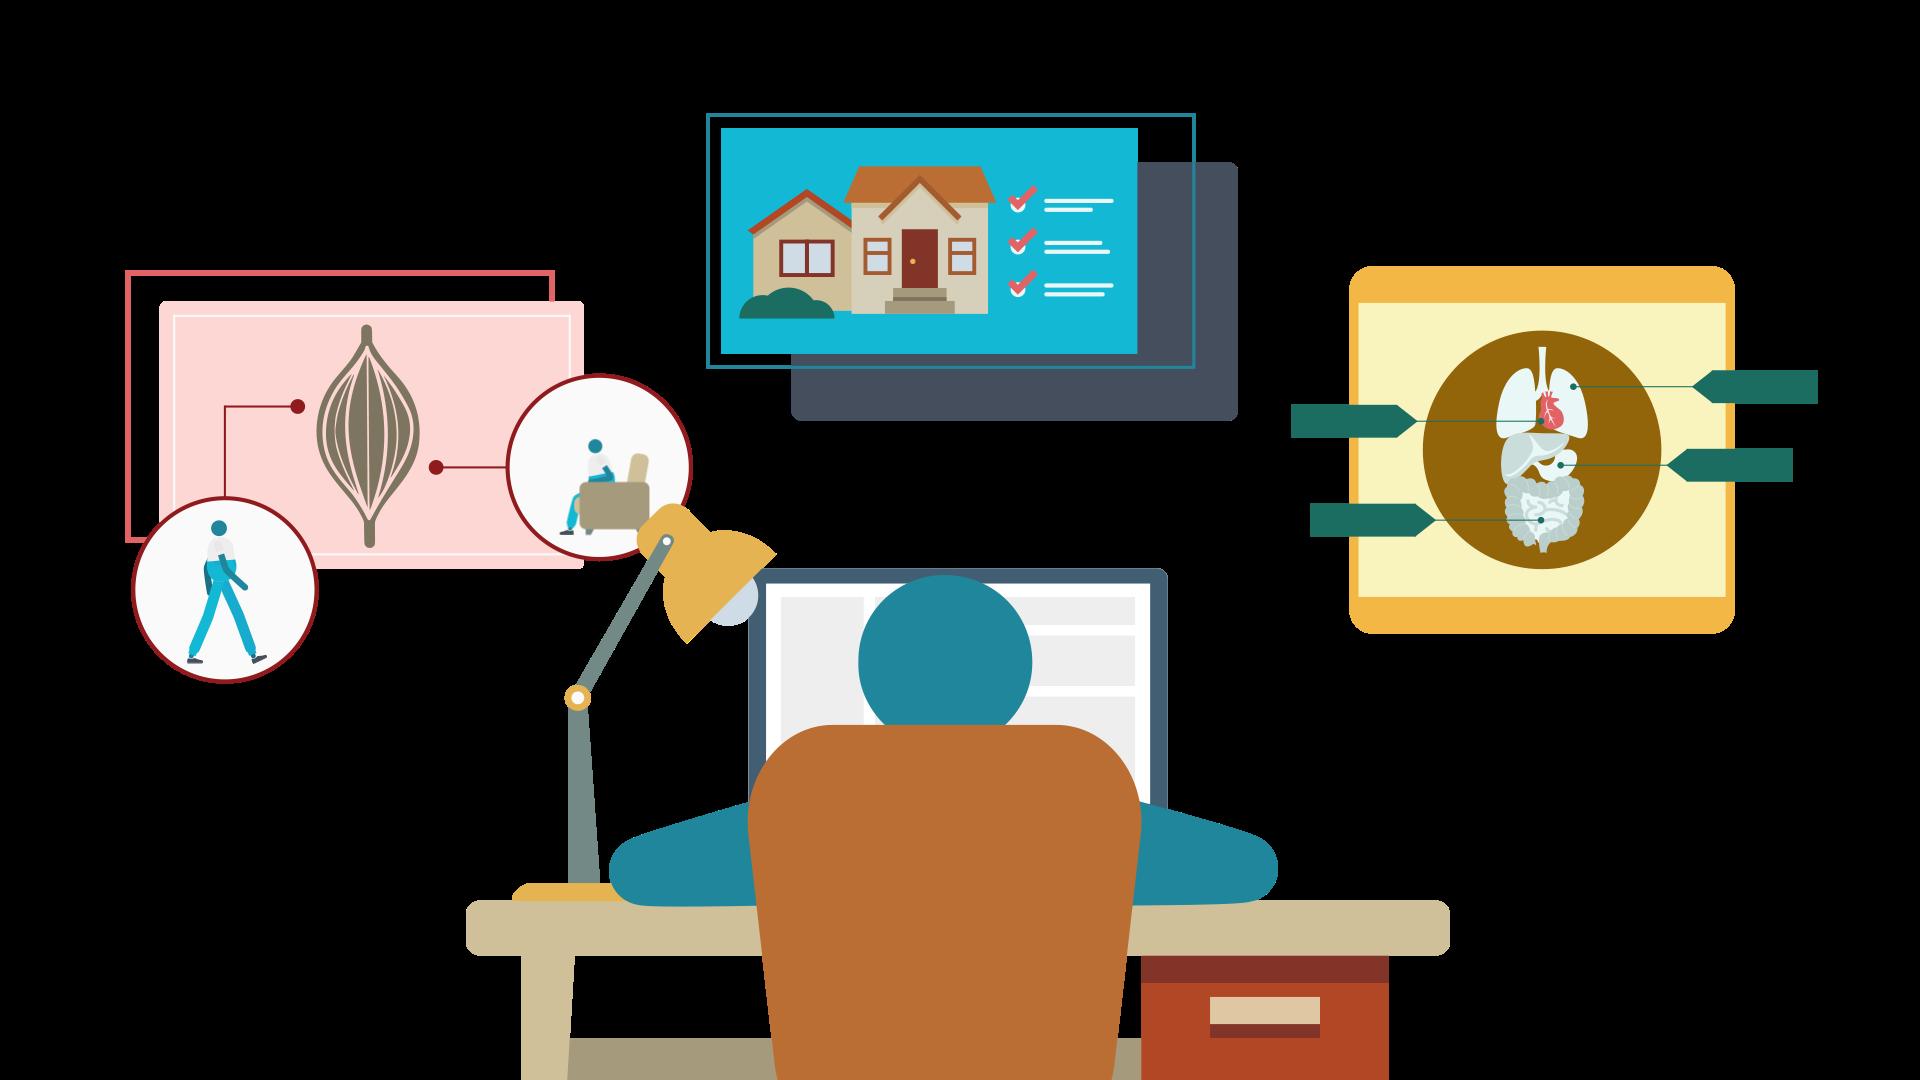 Benefits of a digital patient engagement platforms